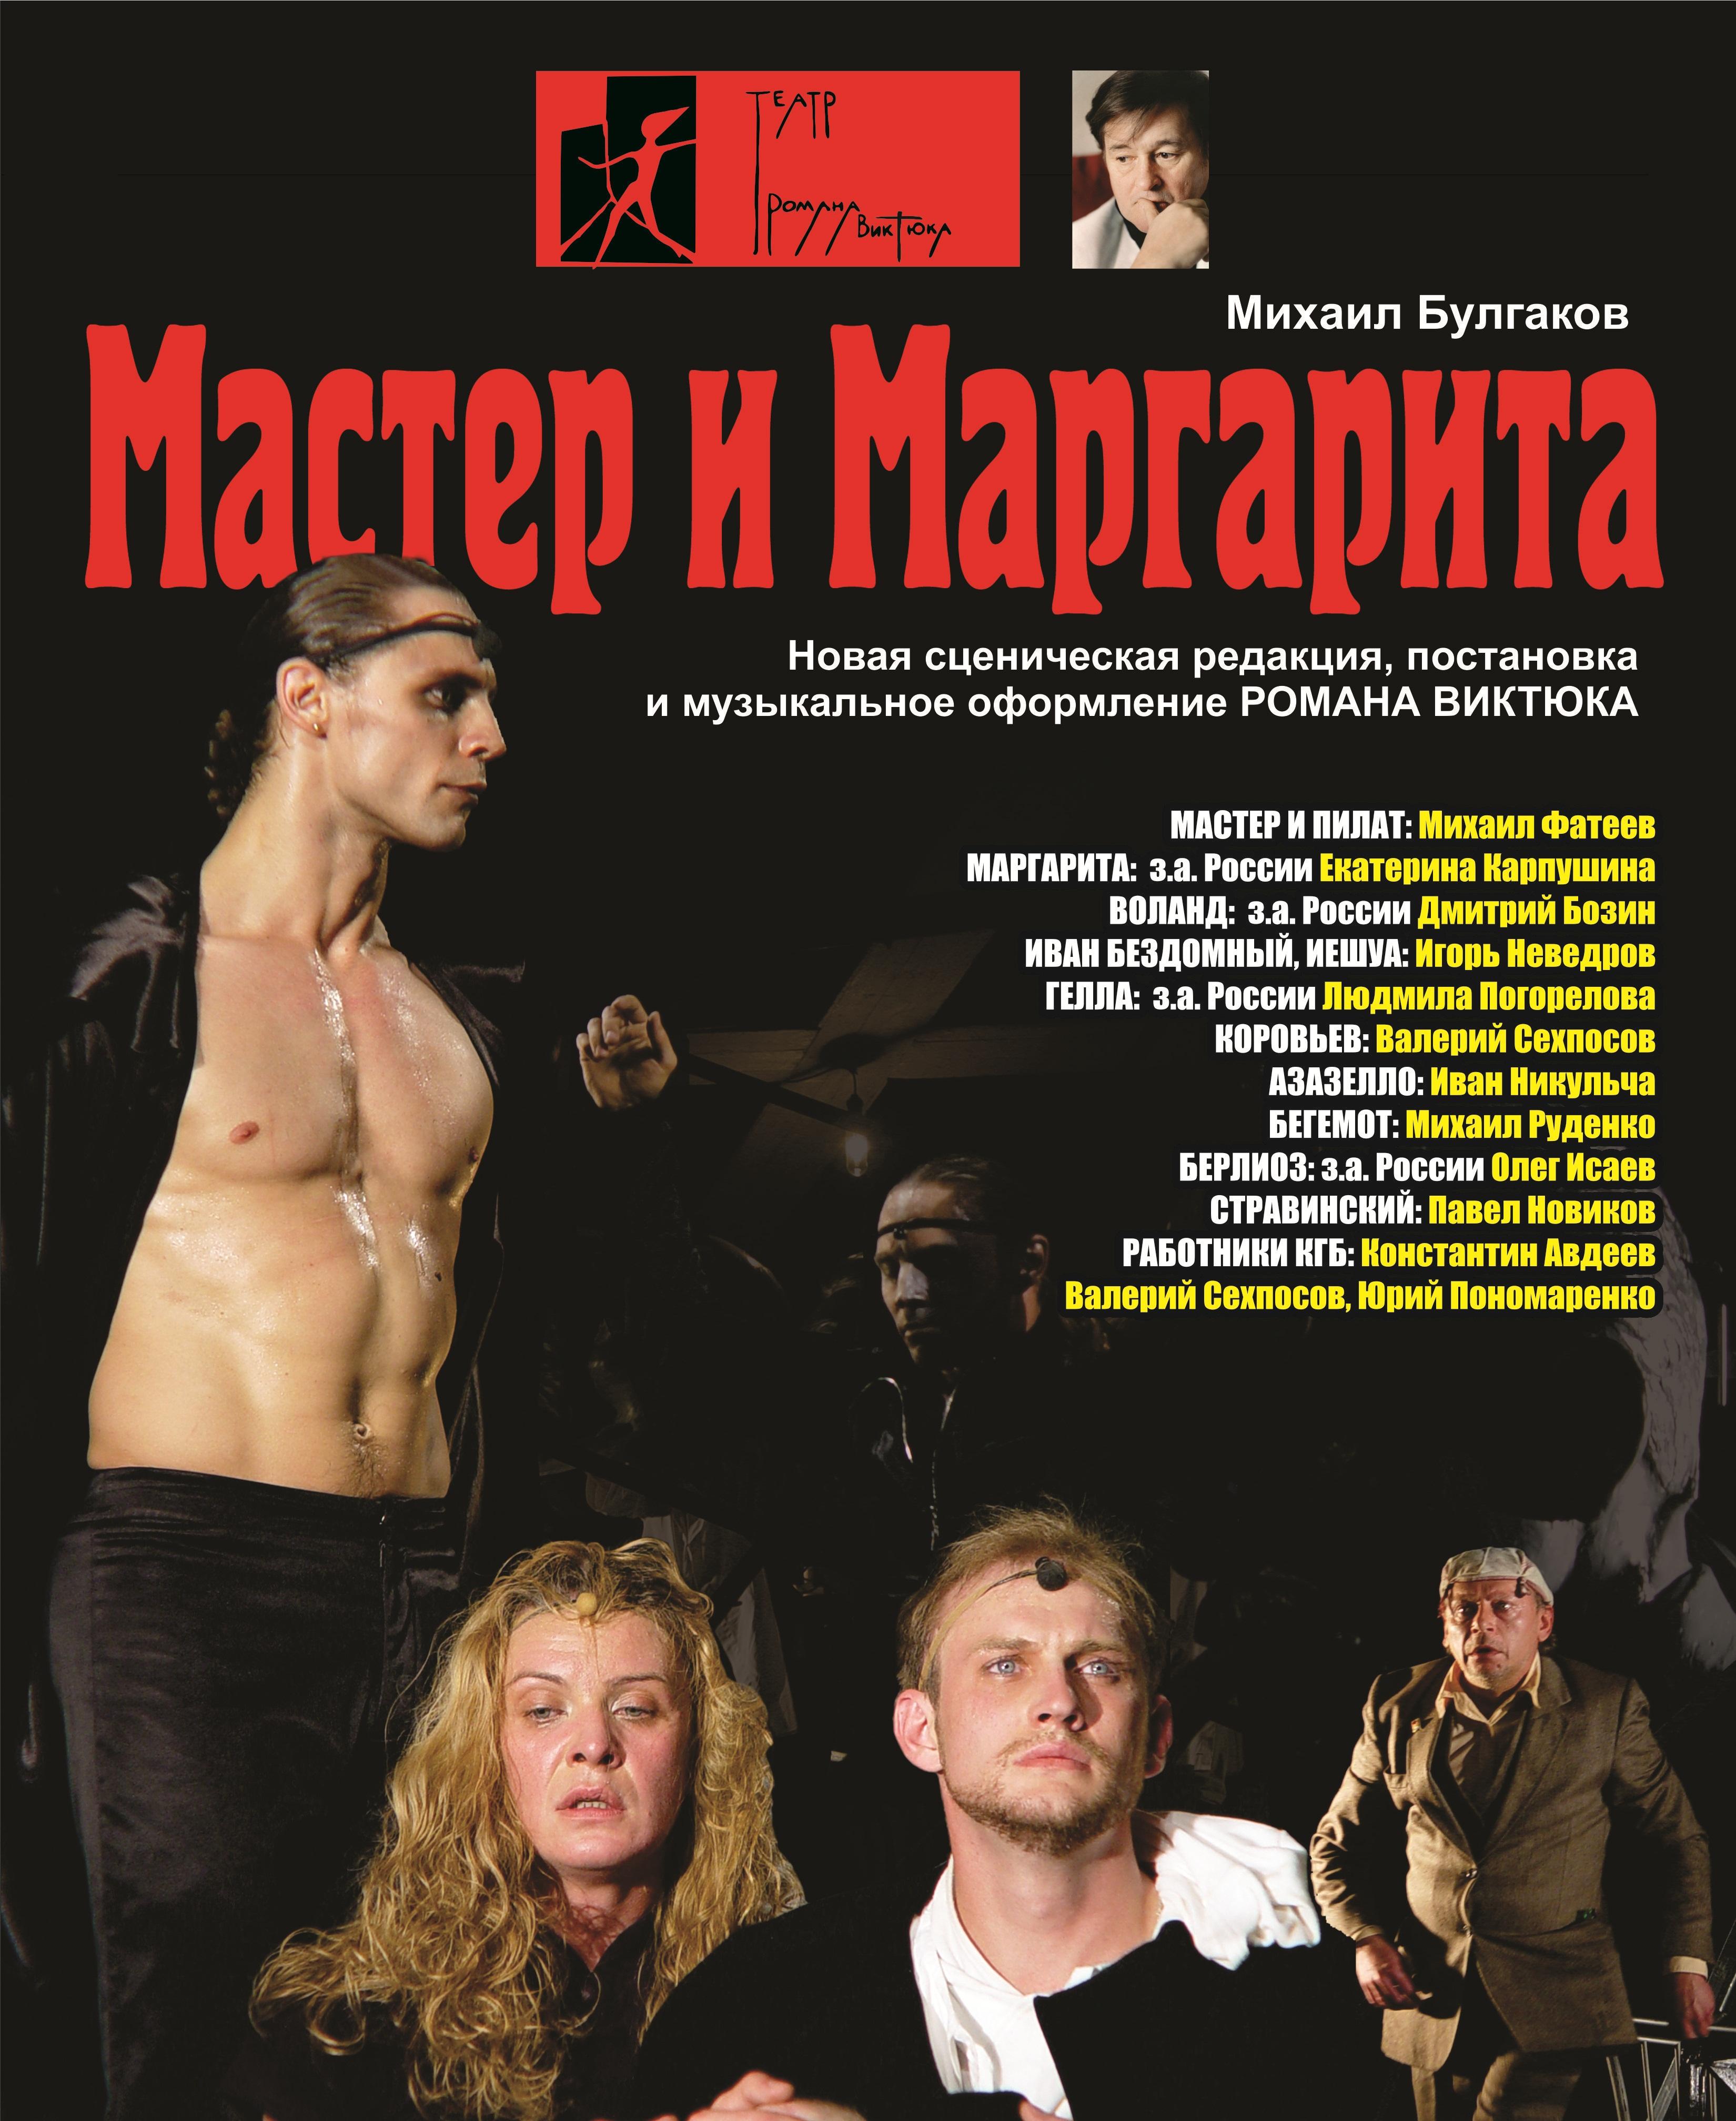 Театр виктюка афиша на ноябрь 2016 афиша кино корстон серпухова